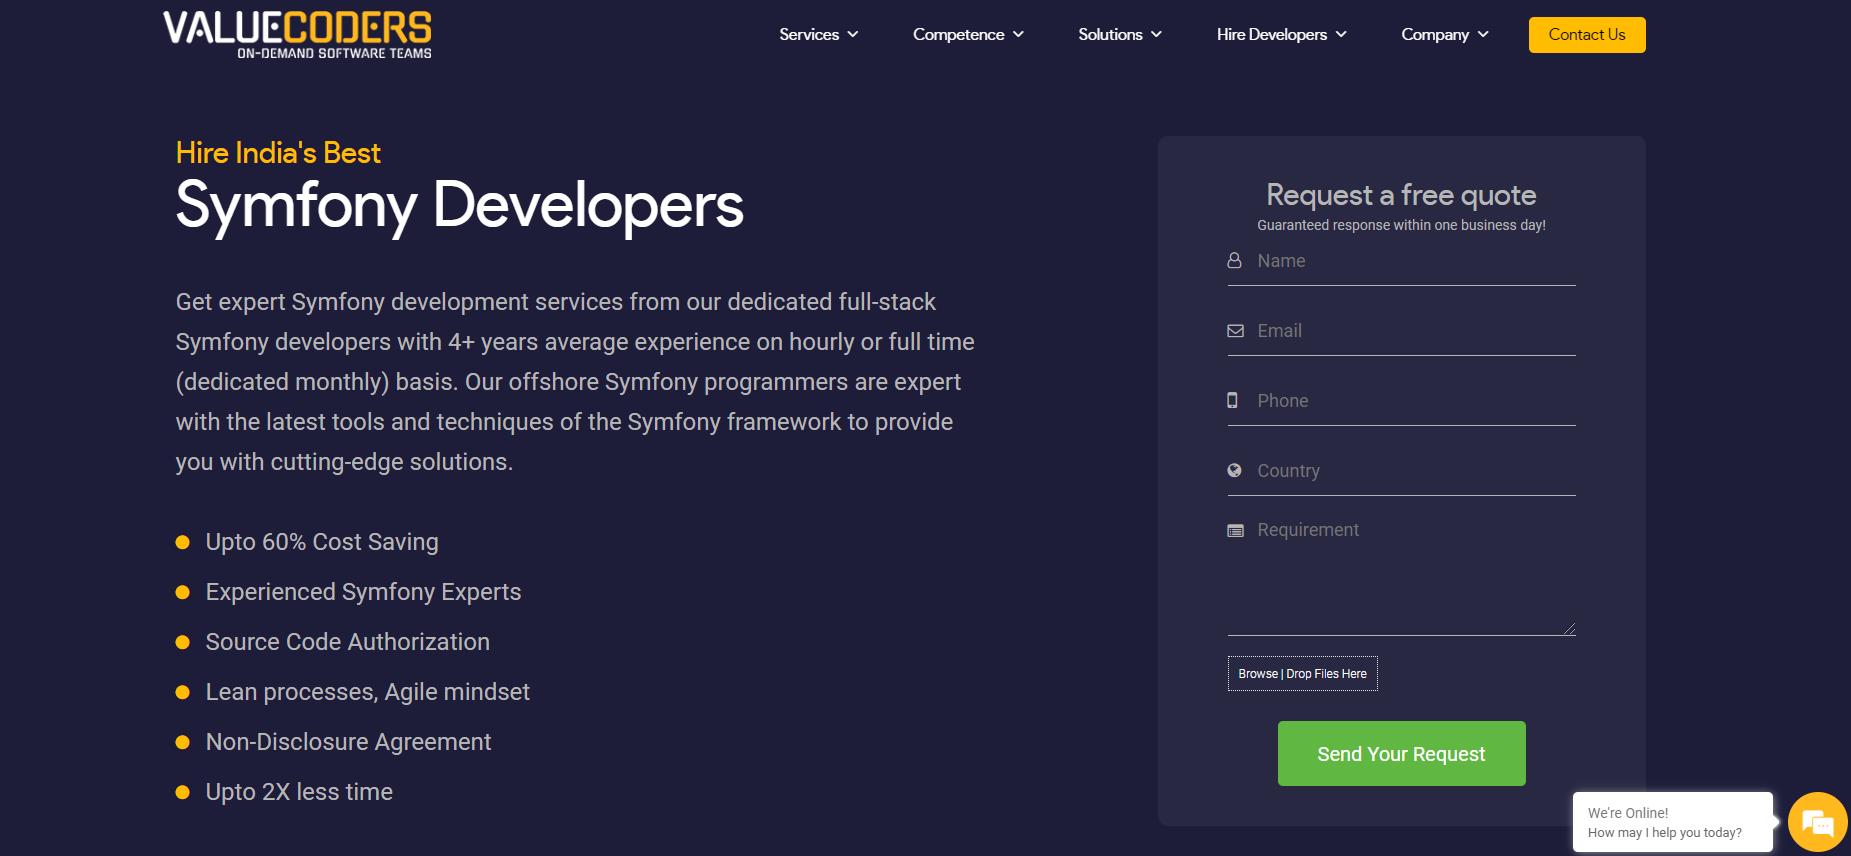 Valuecoders symfony developers